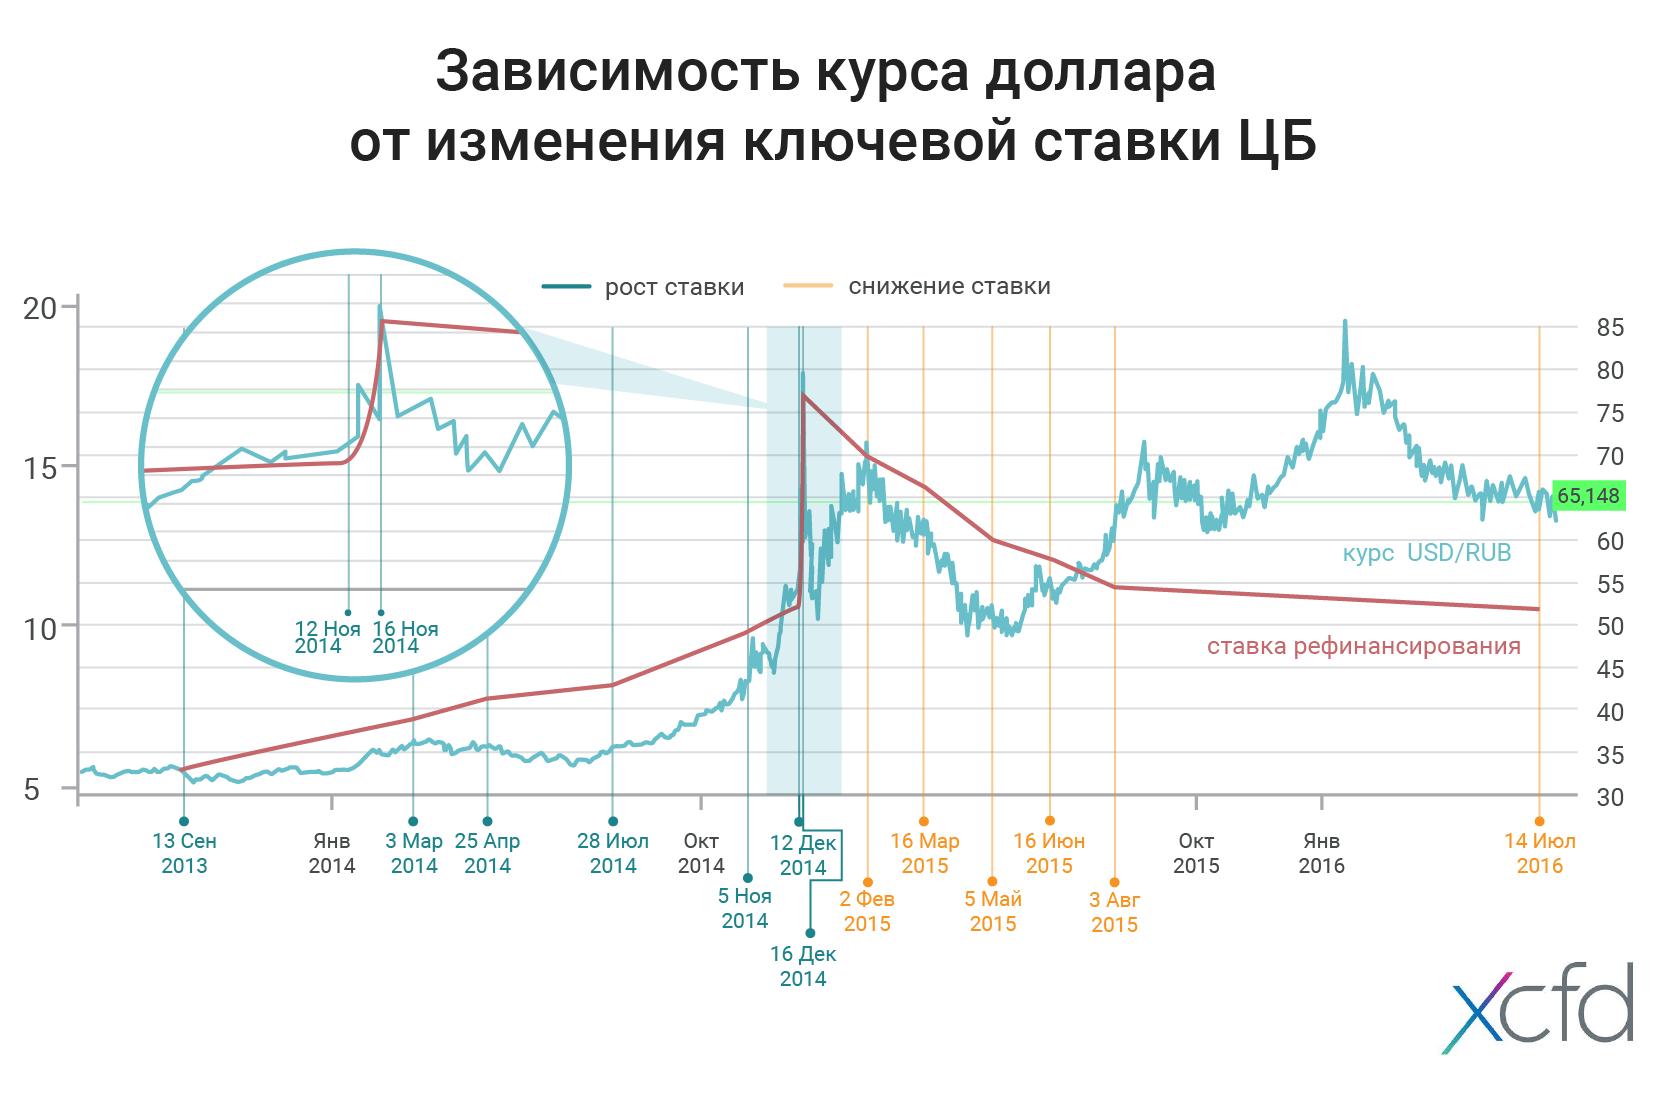 Как процентная ставка влияет на курс